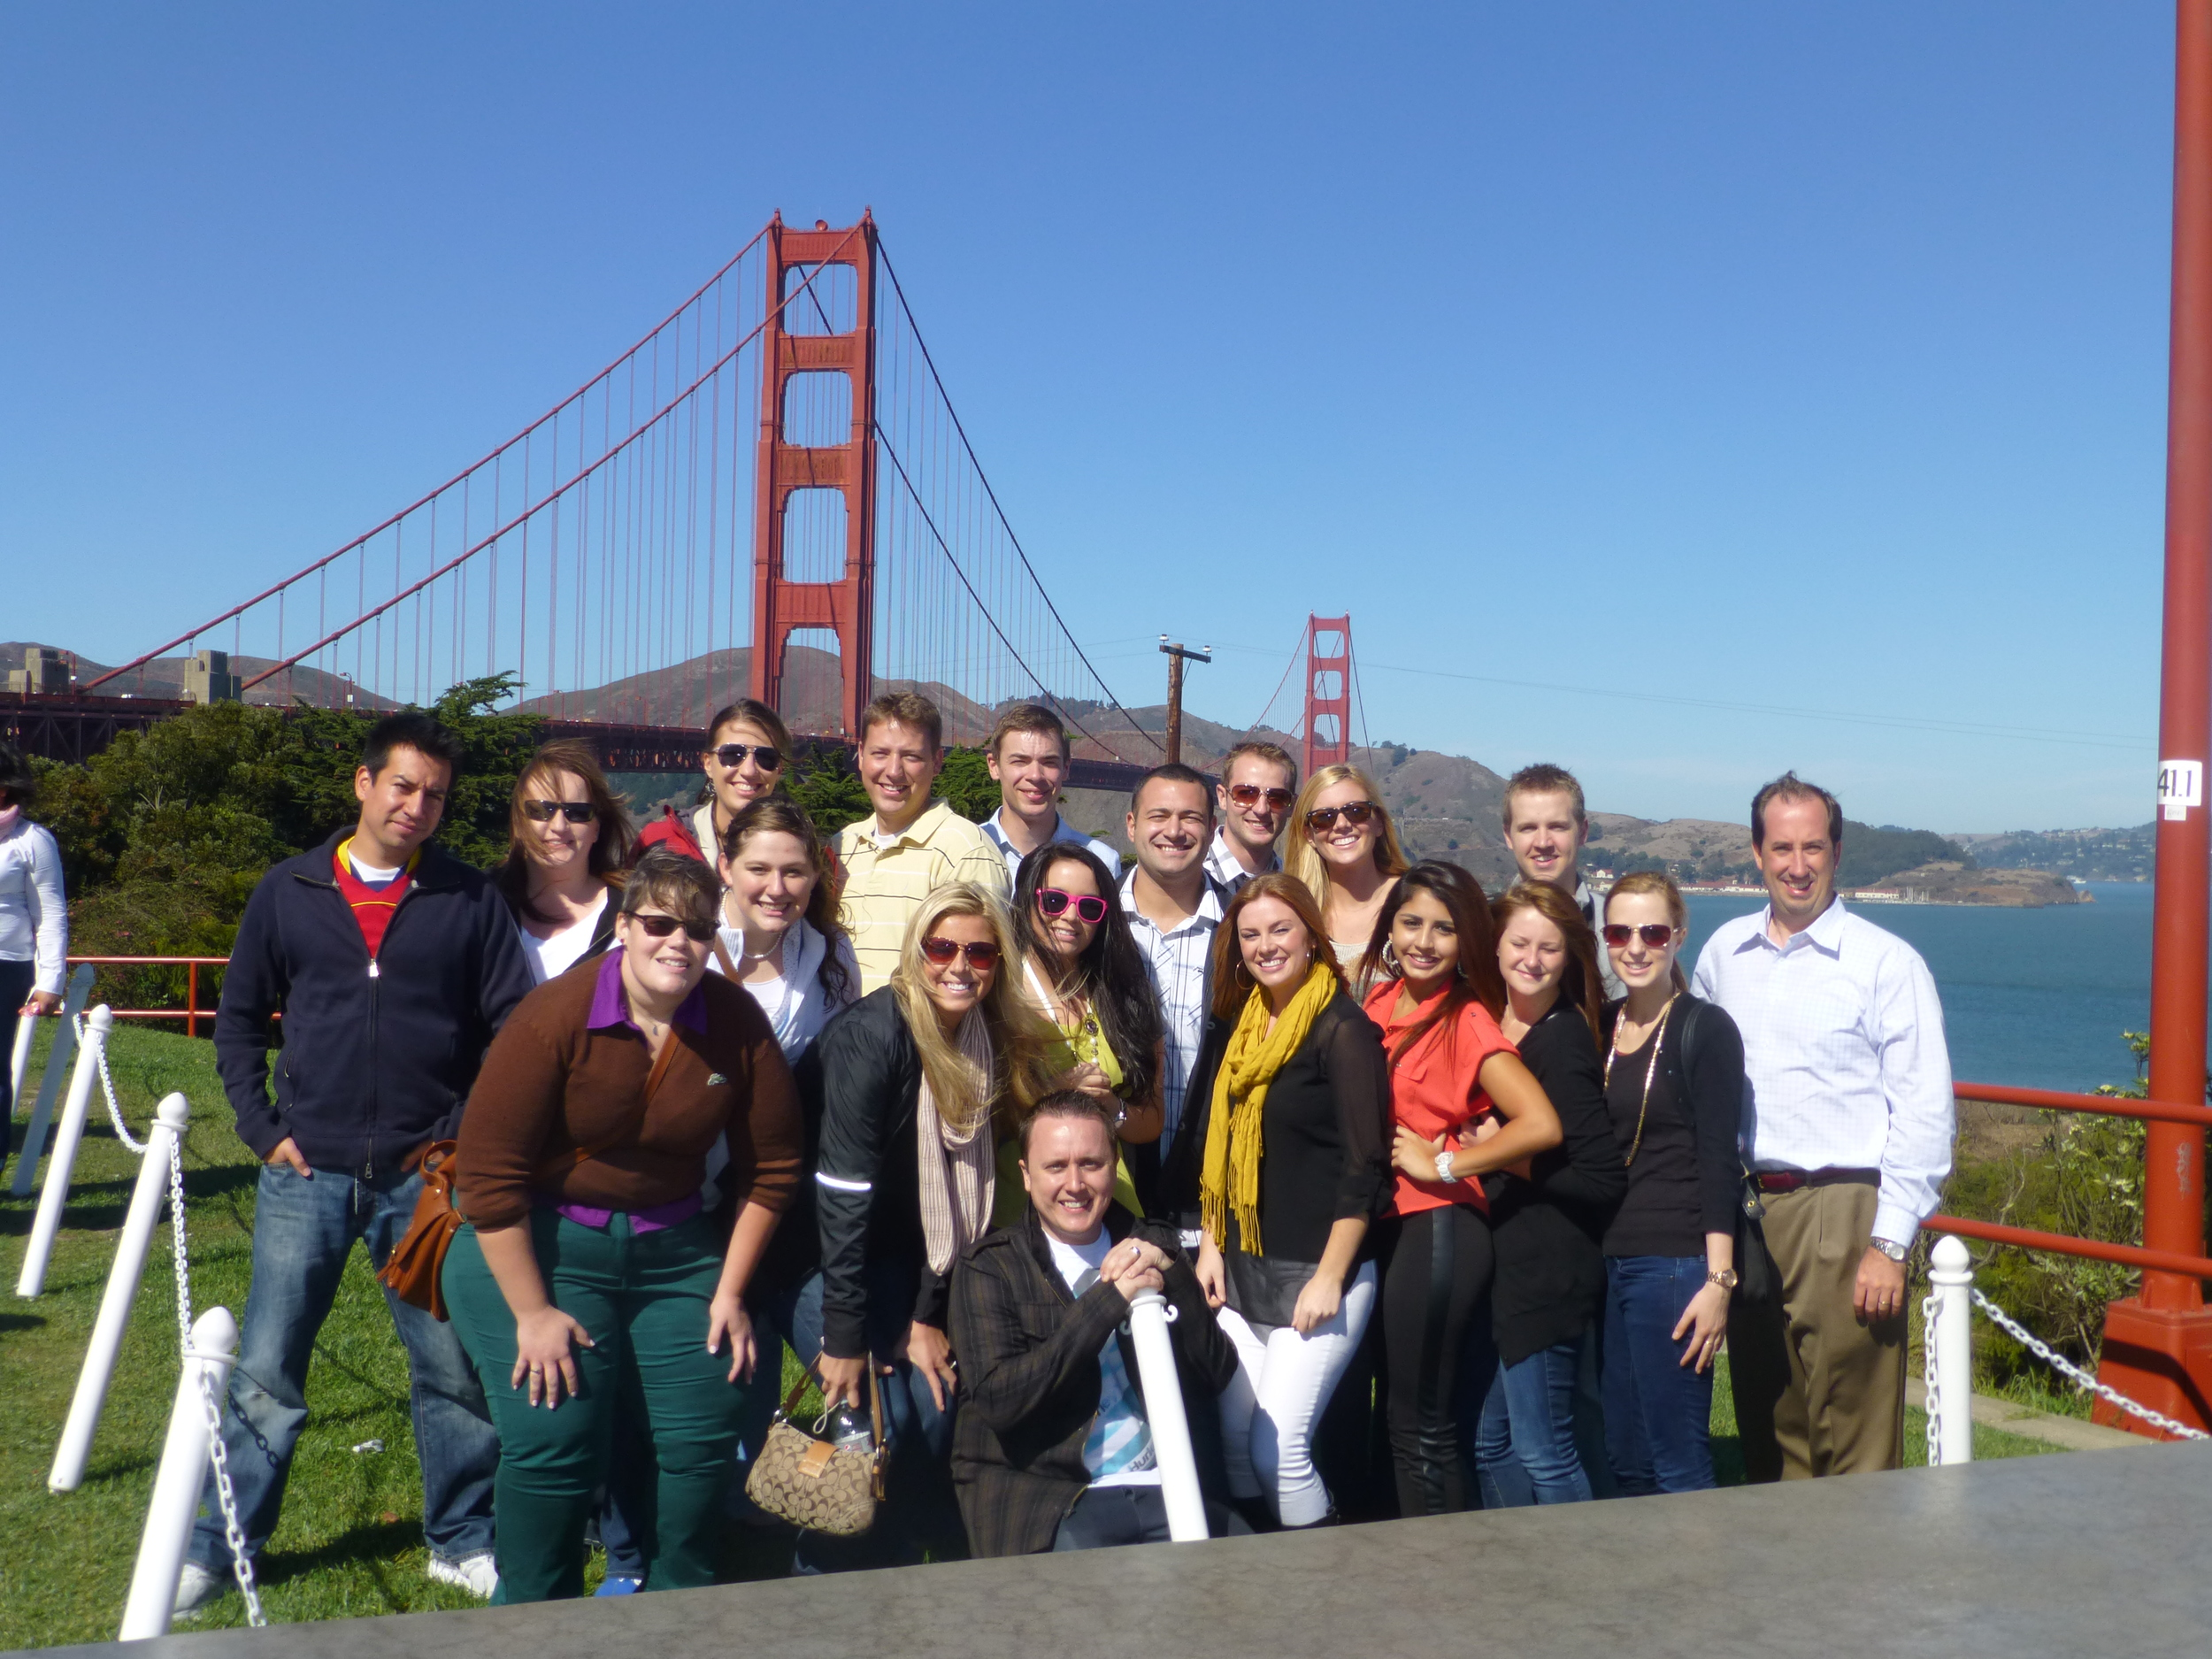 2012 PRSSA National Conference San Fran- Golden Gate Bridge.jpg